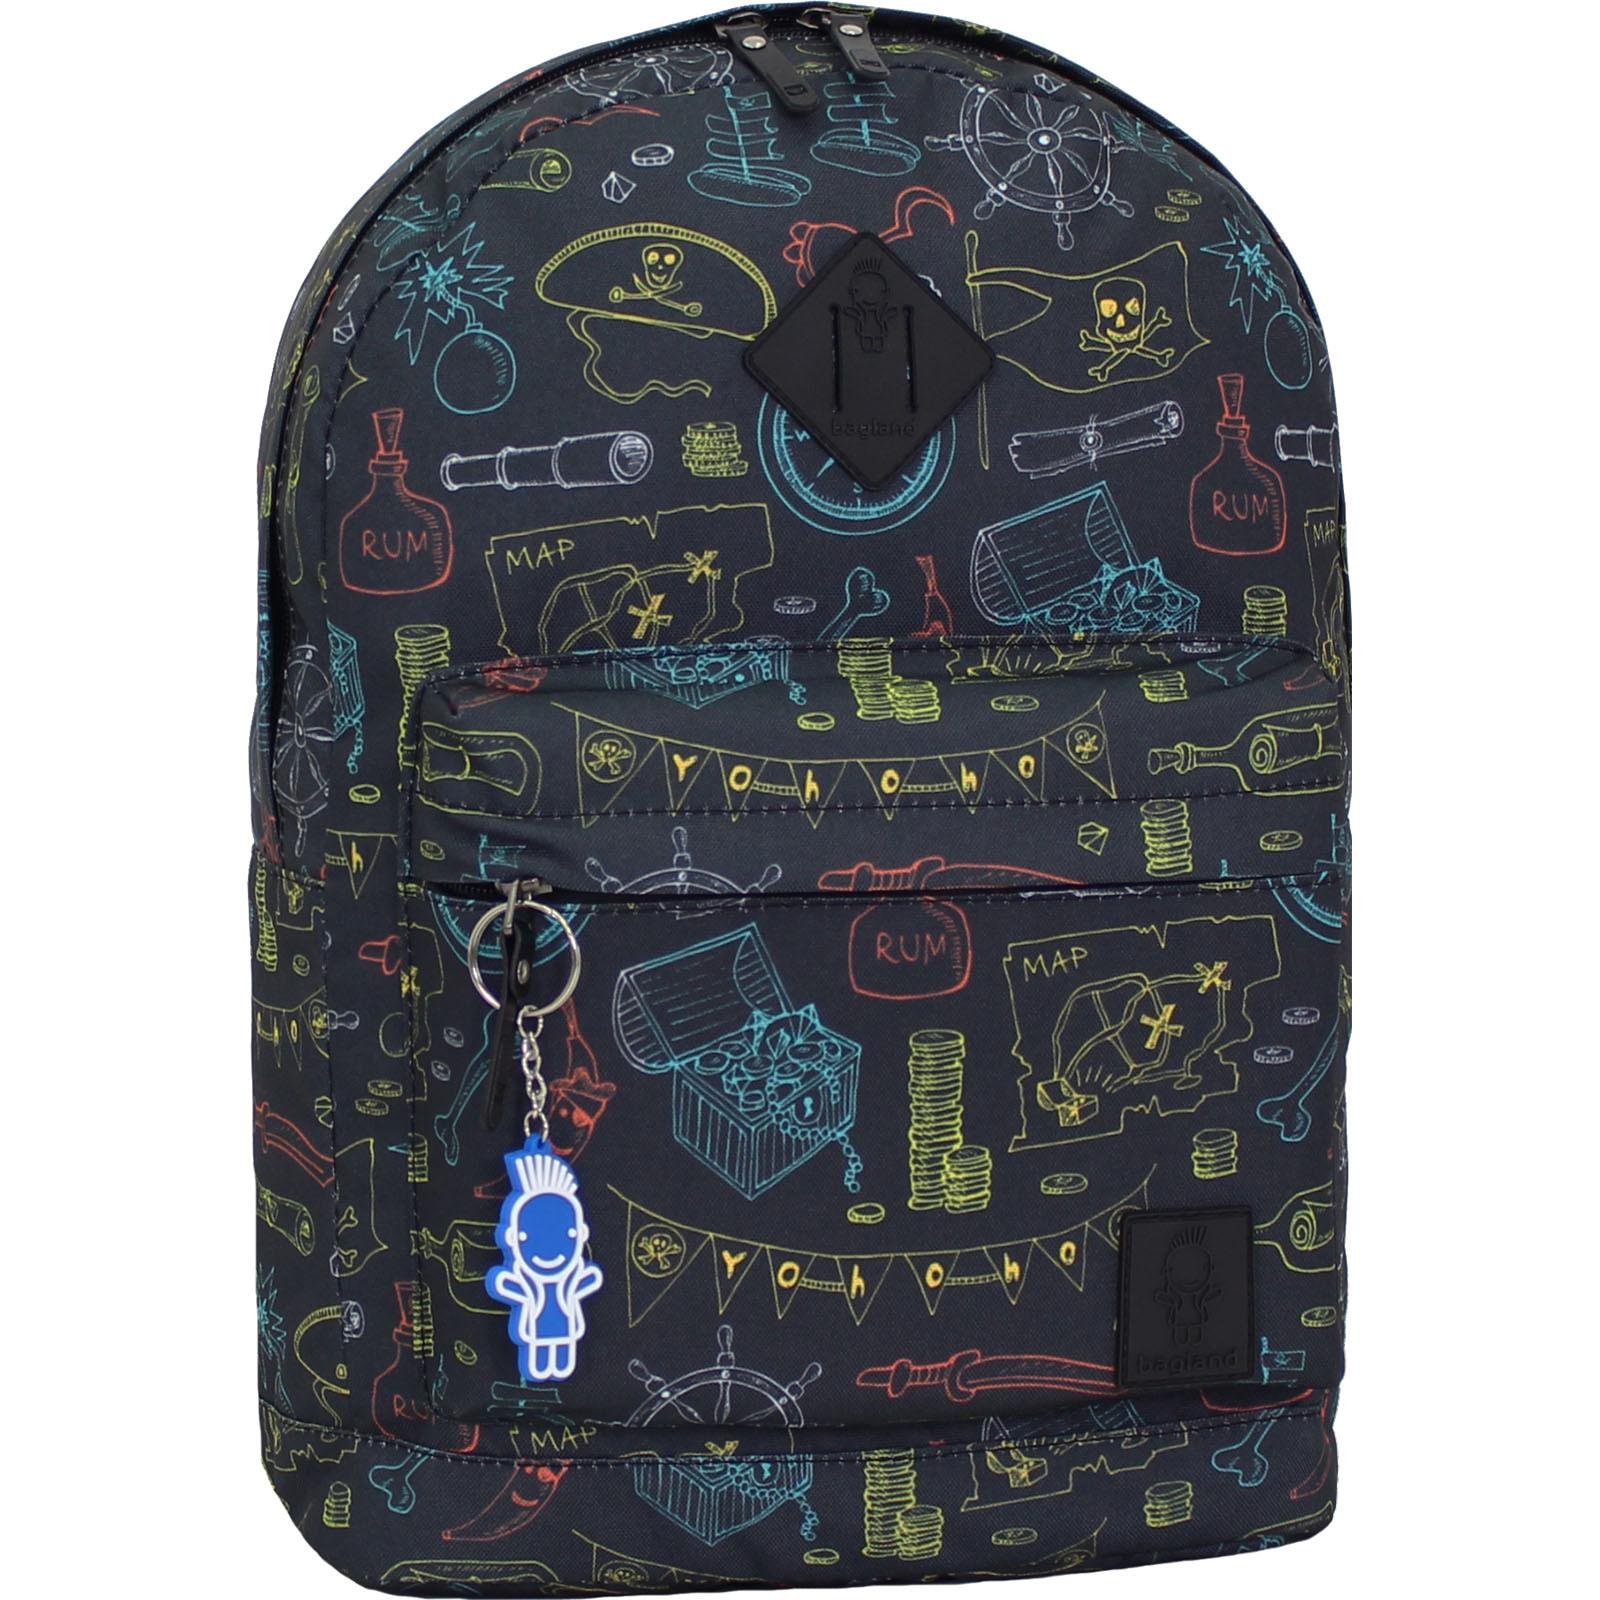 Городские рюкзаки Рюкзак Bagland Молодежный (дизайн) 17 л. сублимация 258 (00533664) IMG_1103_258.JPG